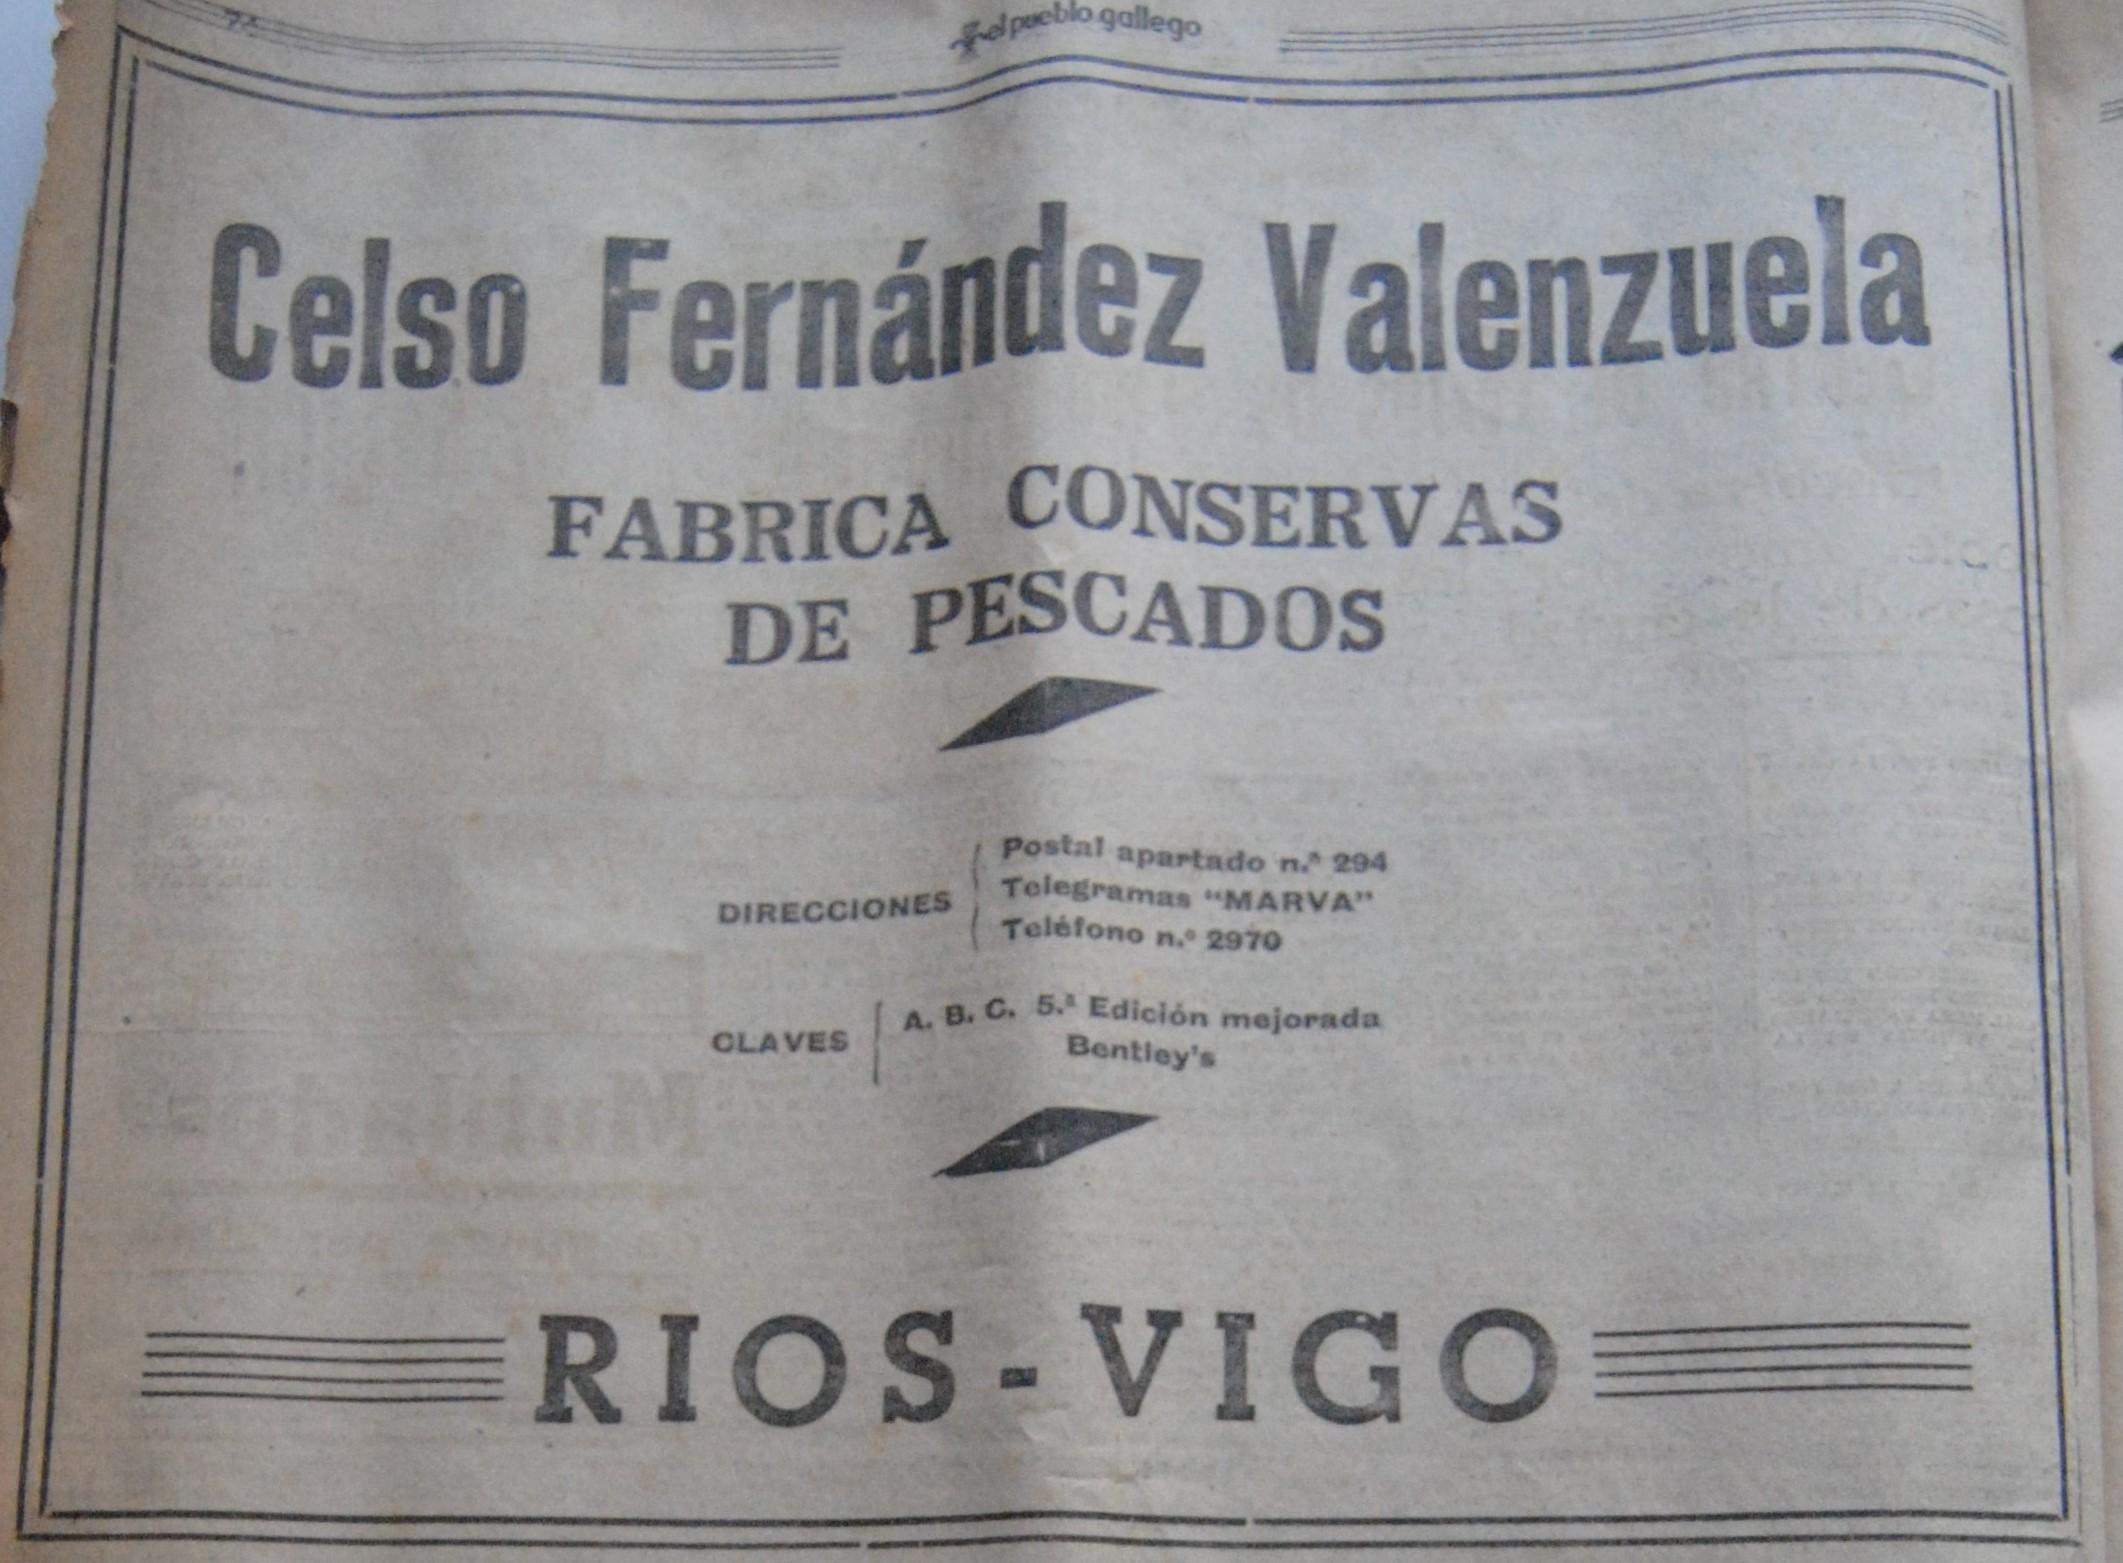 Celso Fdez. Valenzuela, conserveira